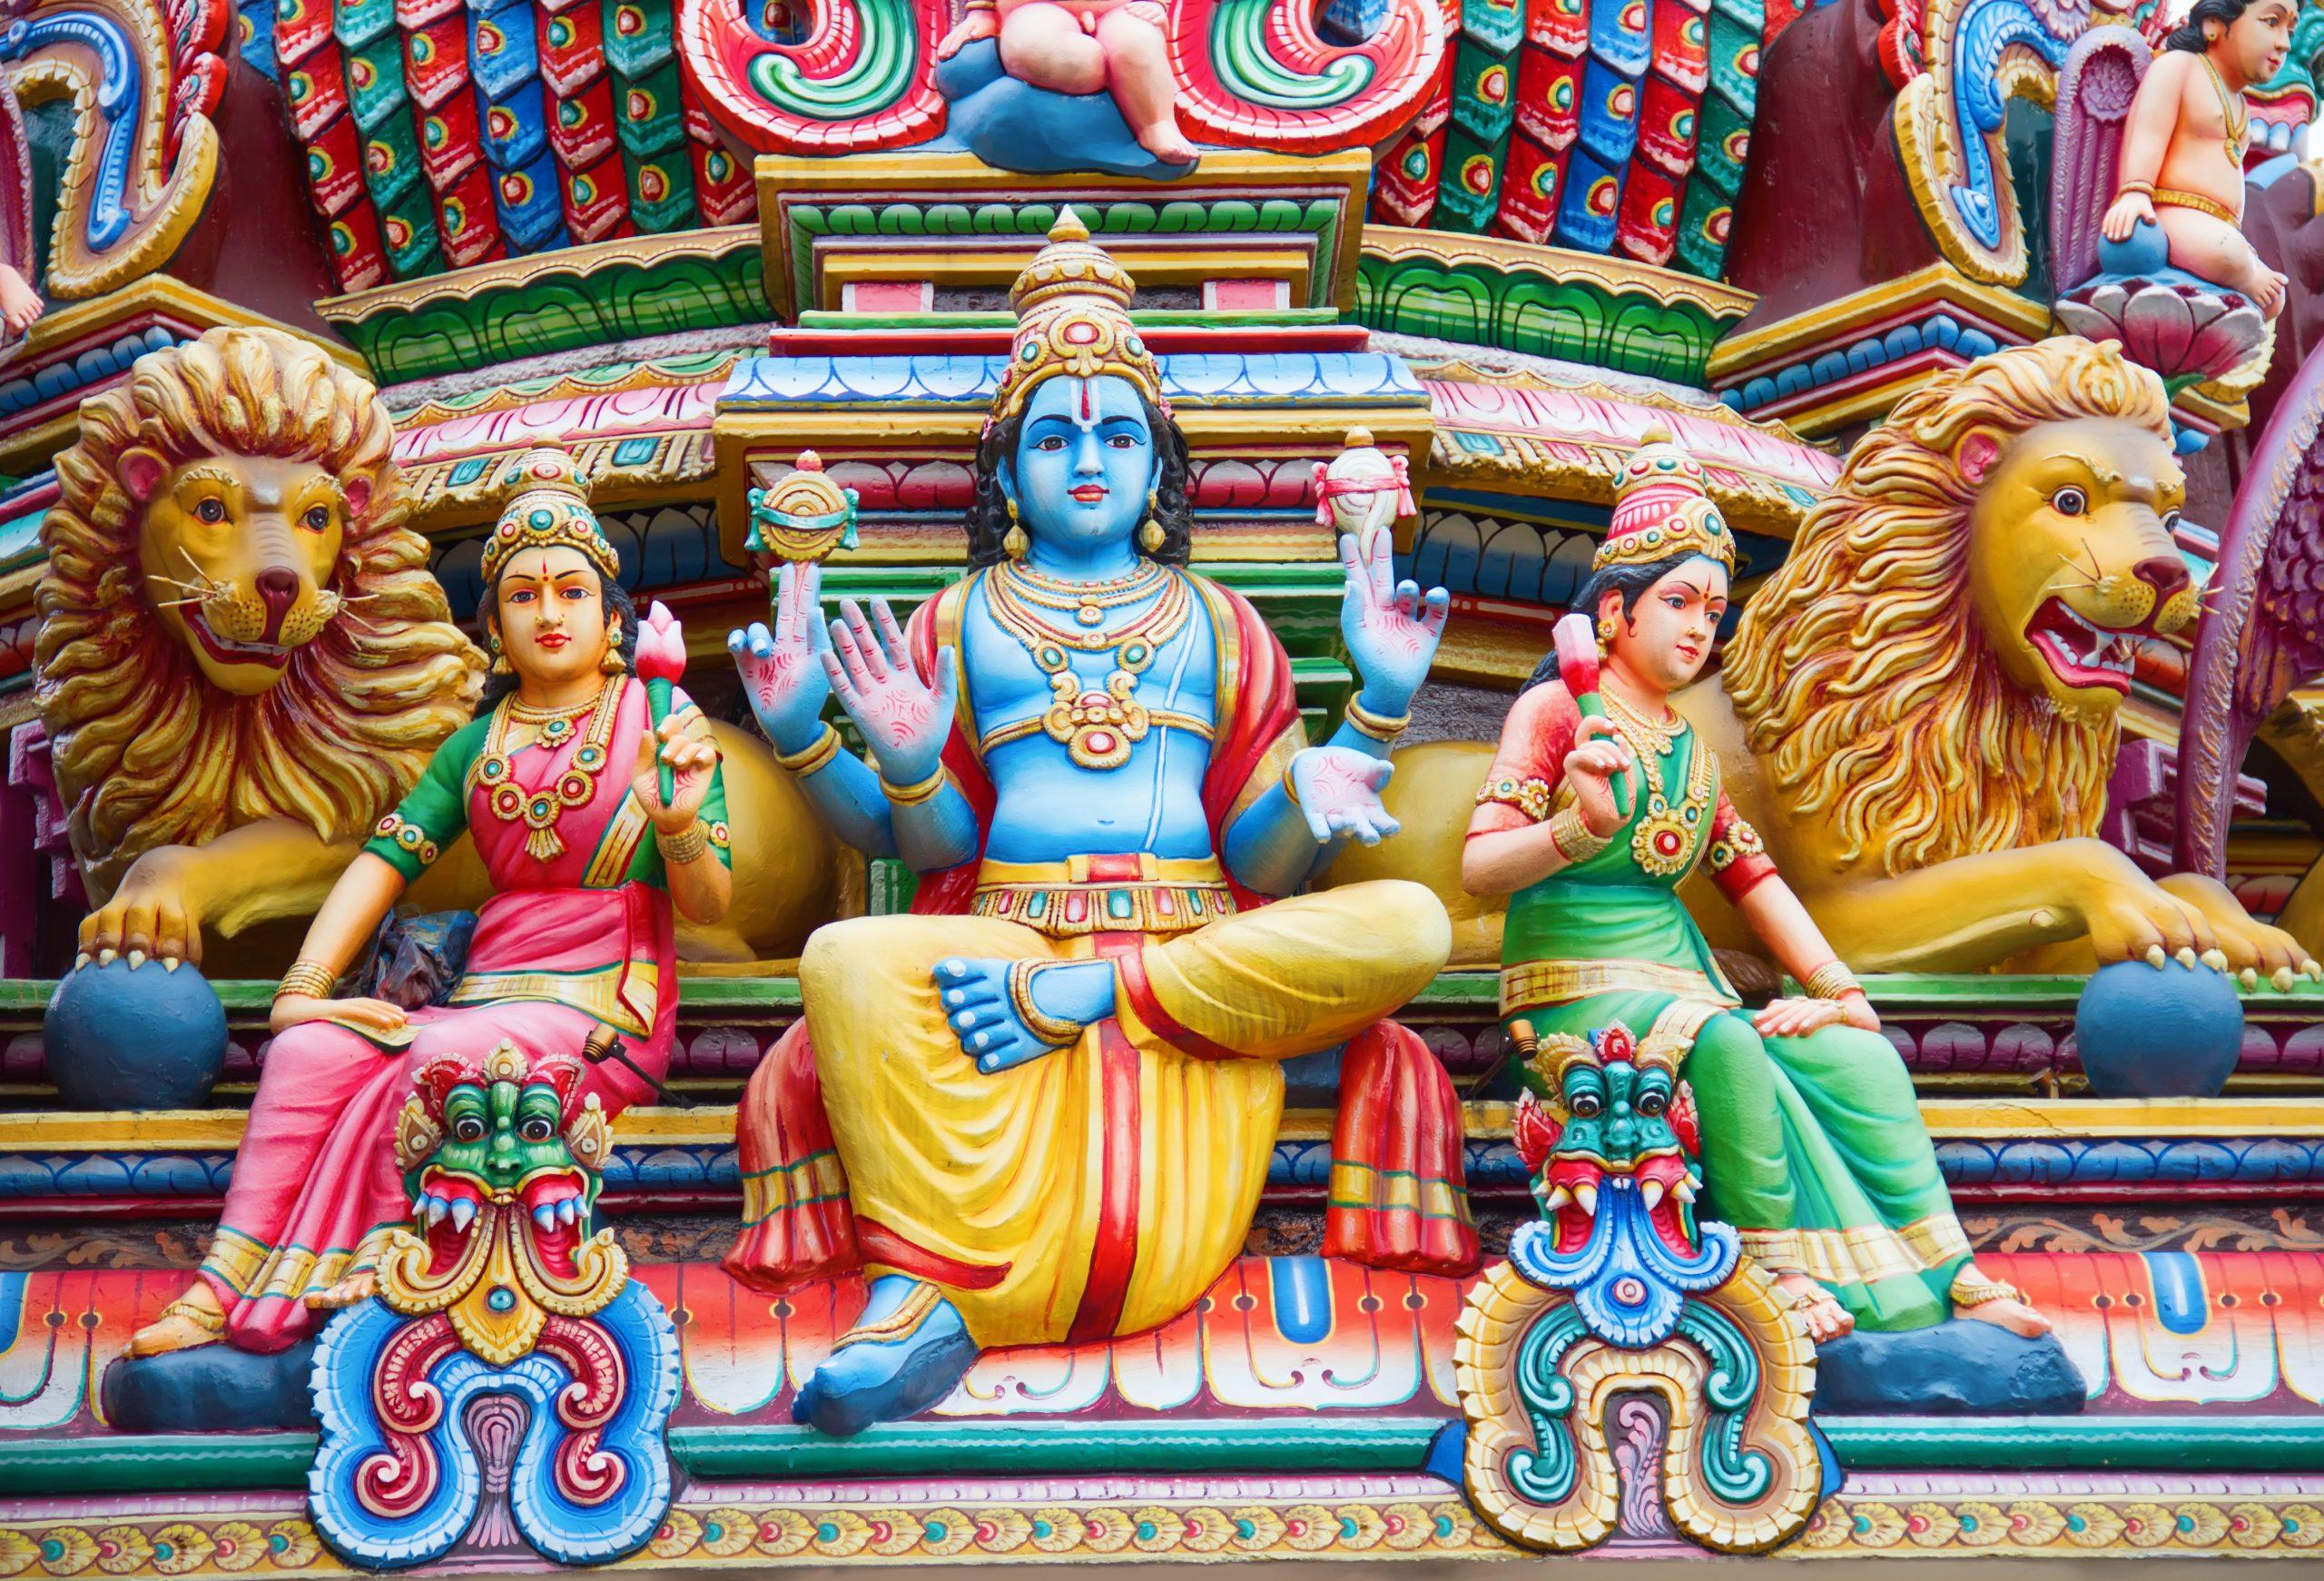 Hindu temple decoration